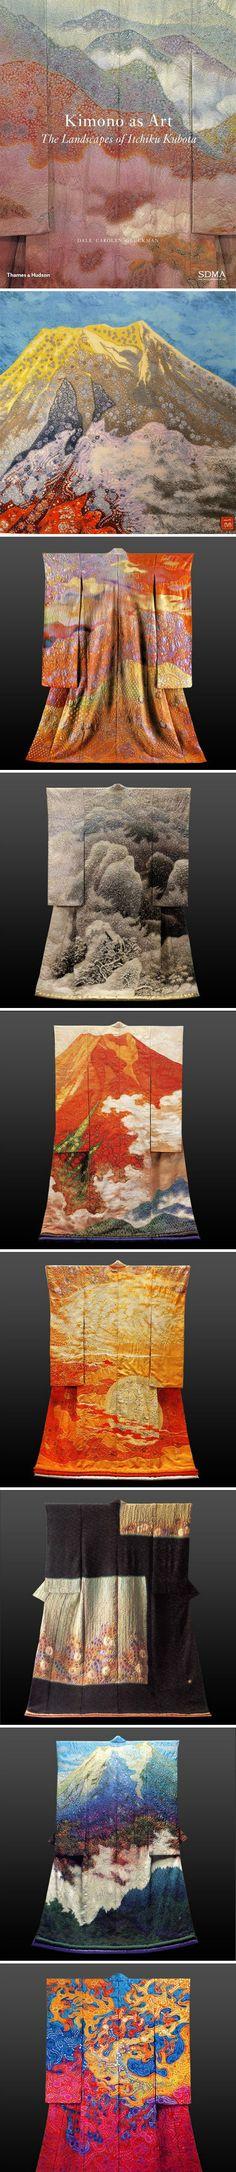 Kimono as Art - Kimono by Itchuku Kubota, Japan